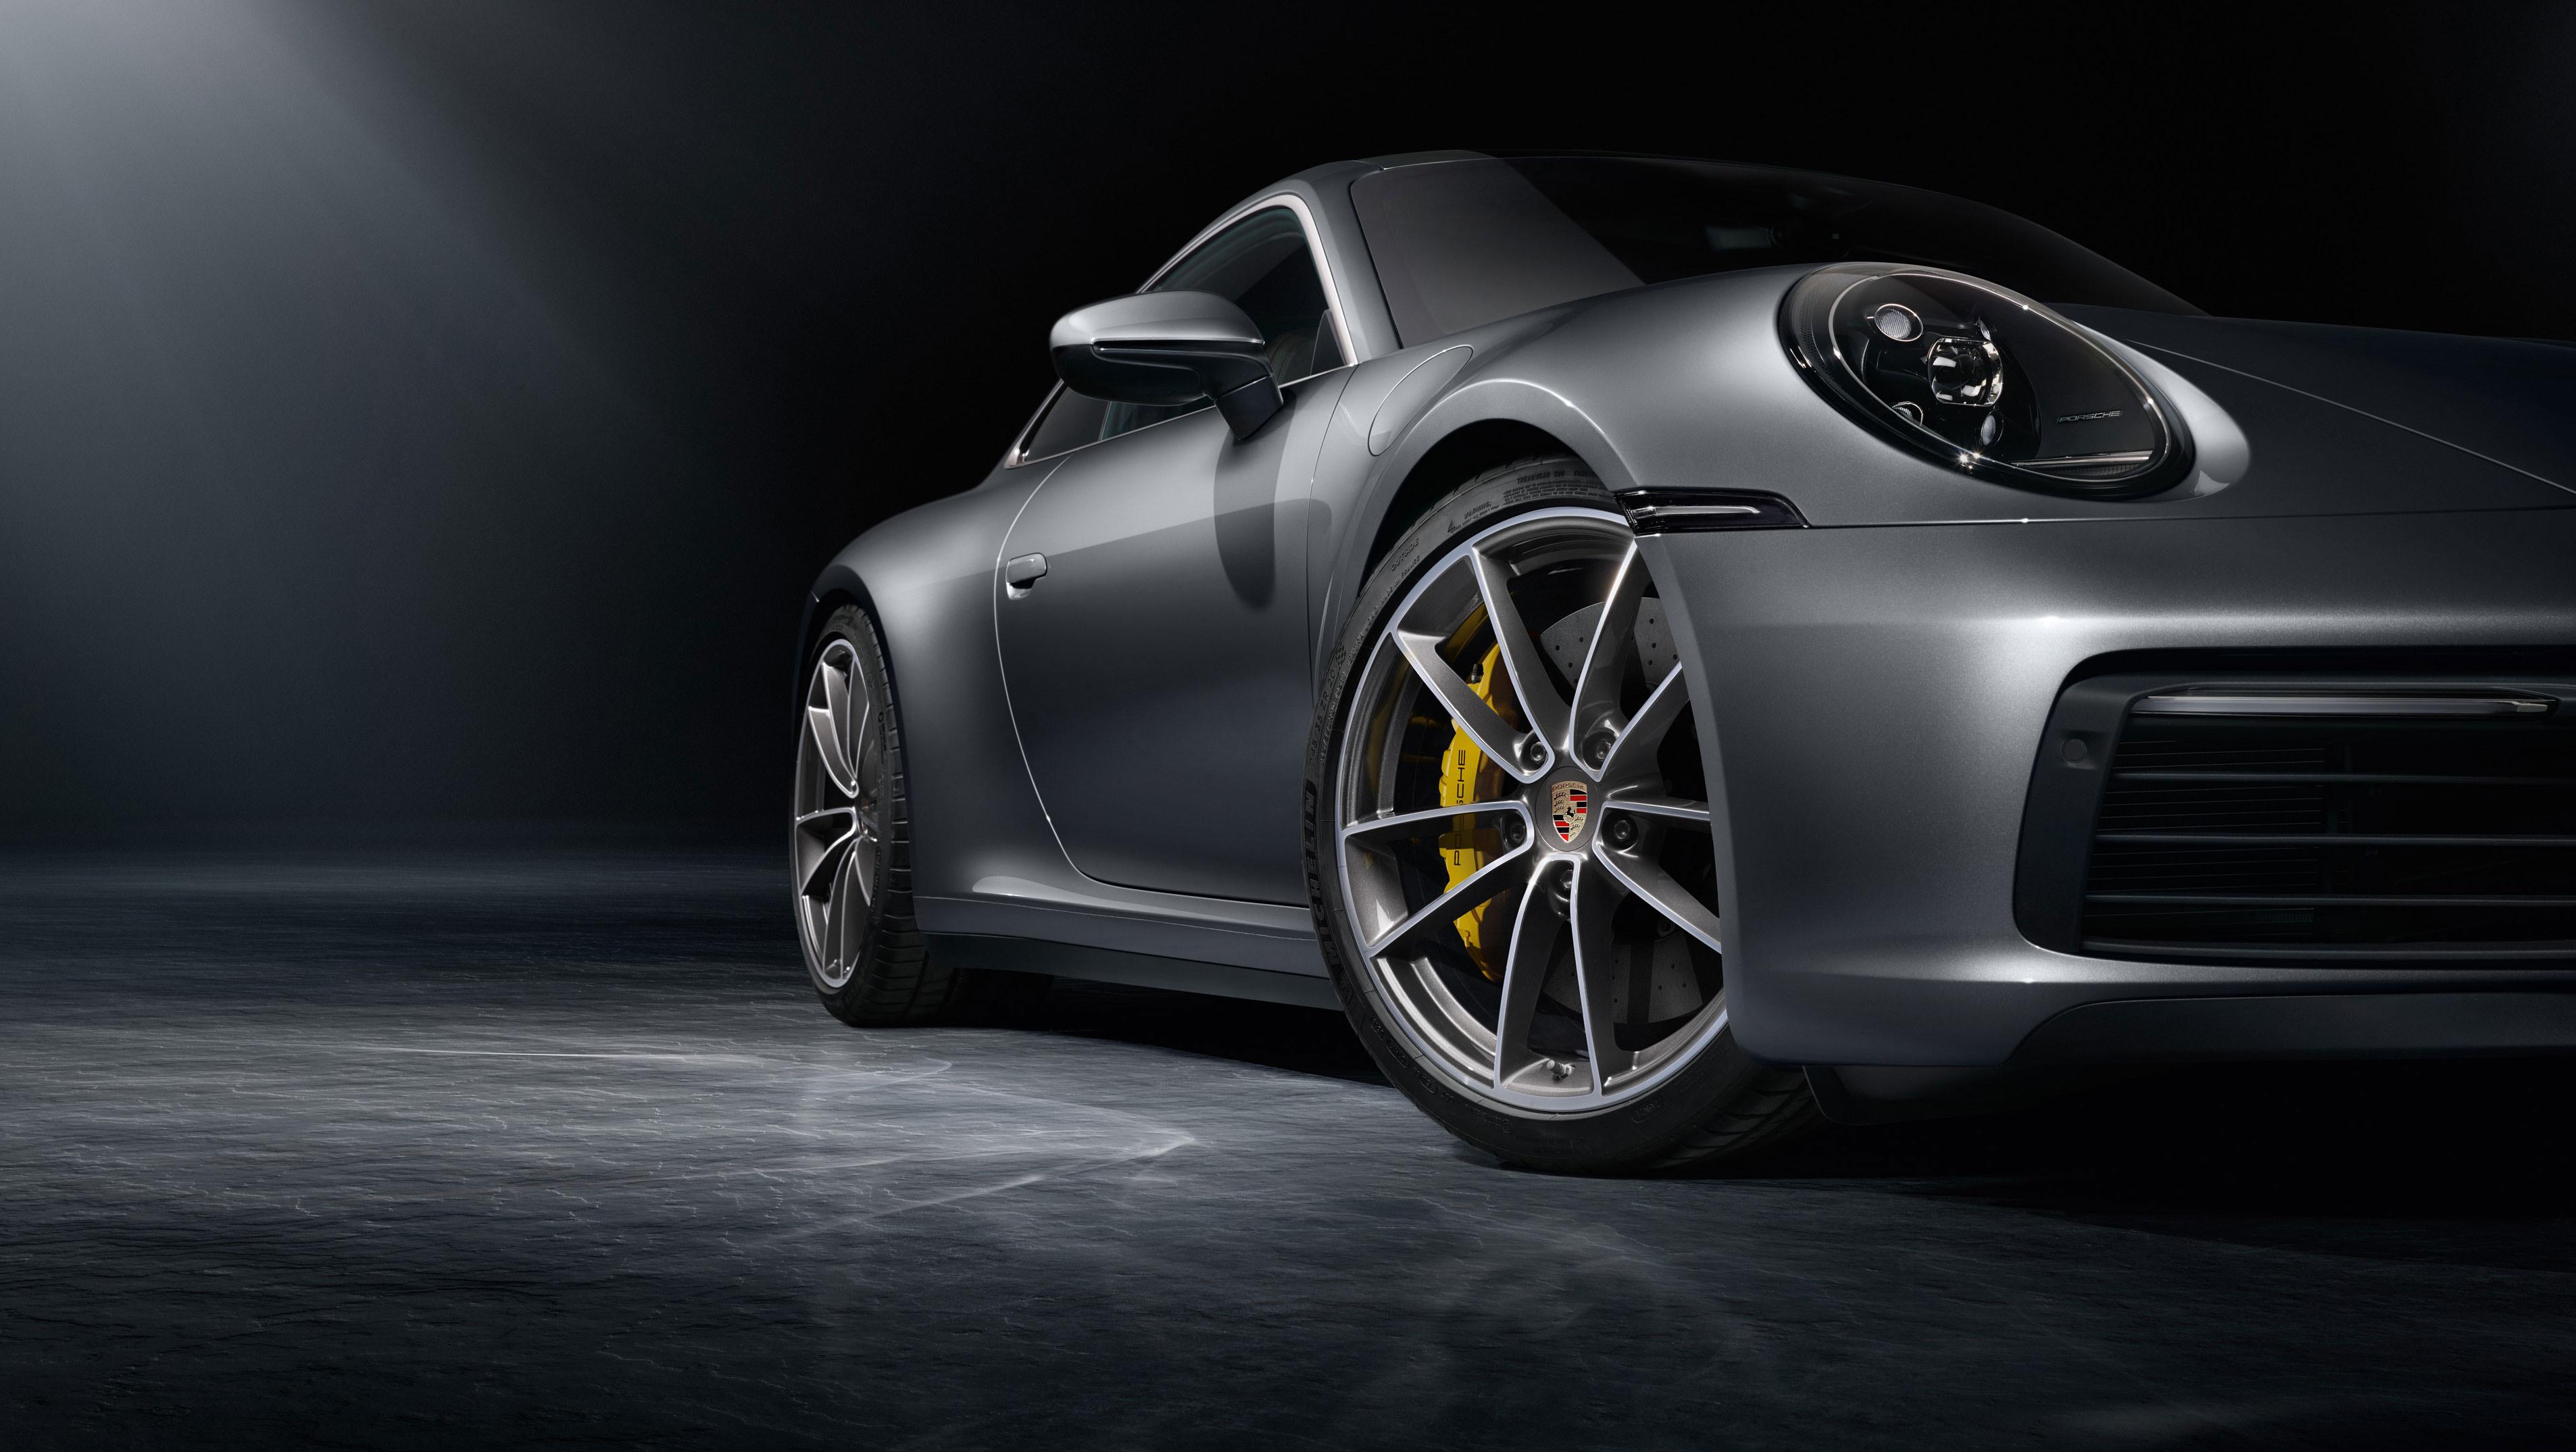 Porsche 911 Carrera S 2019 Hd Cars 4k Wallpapers Images